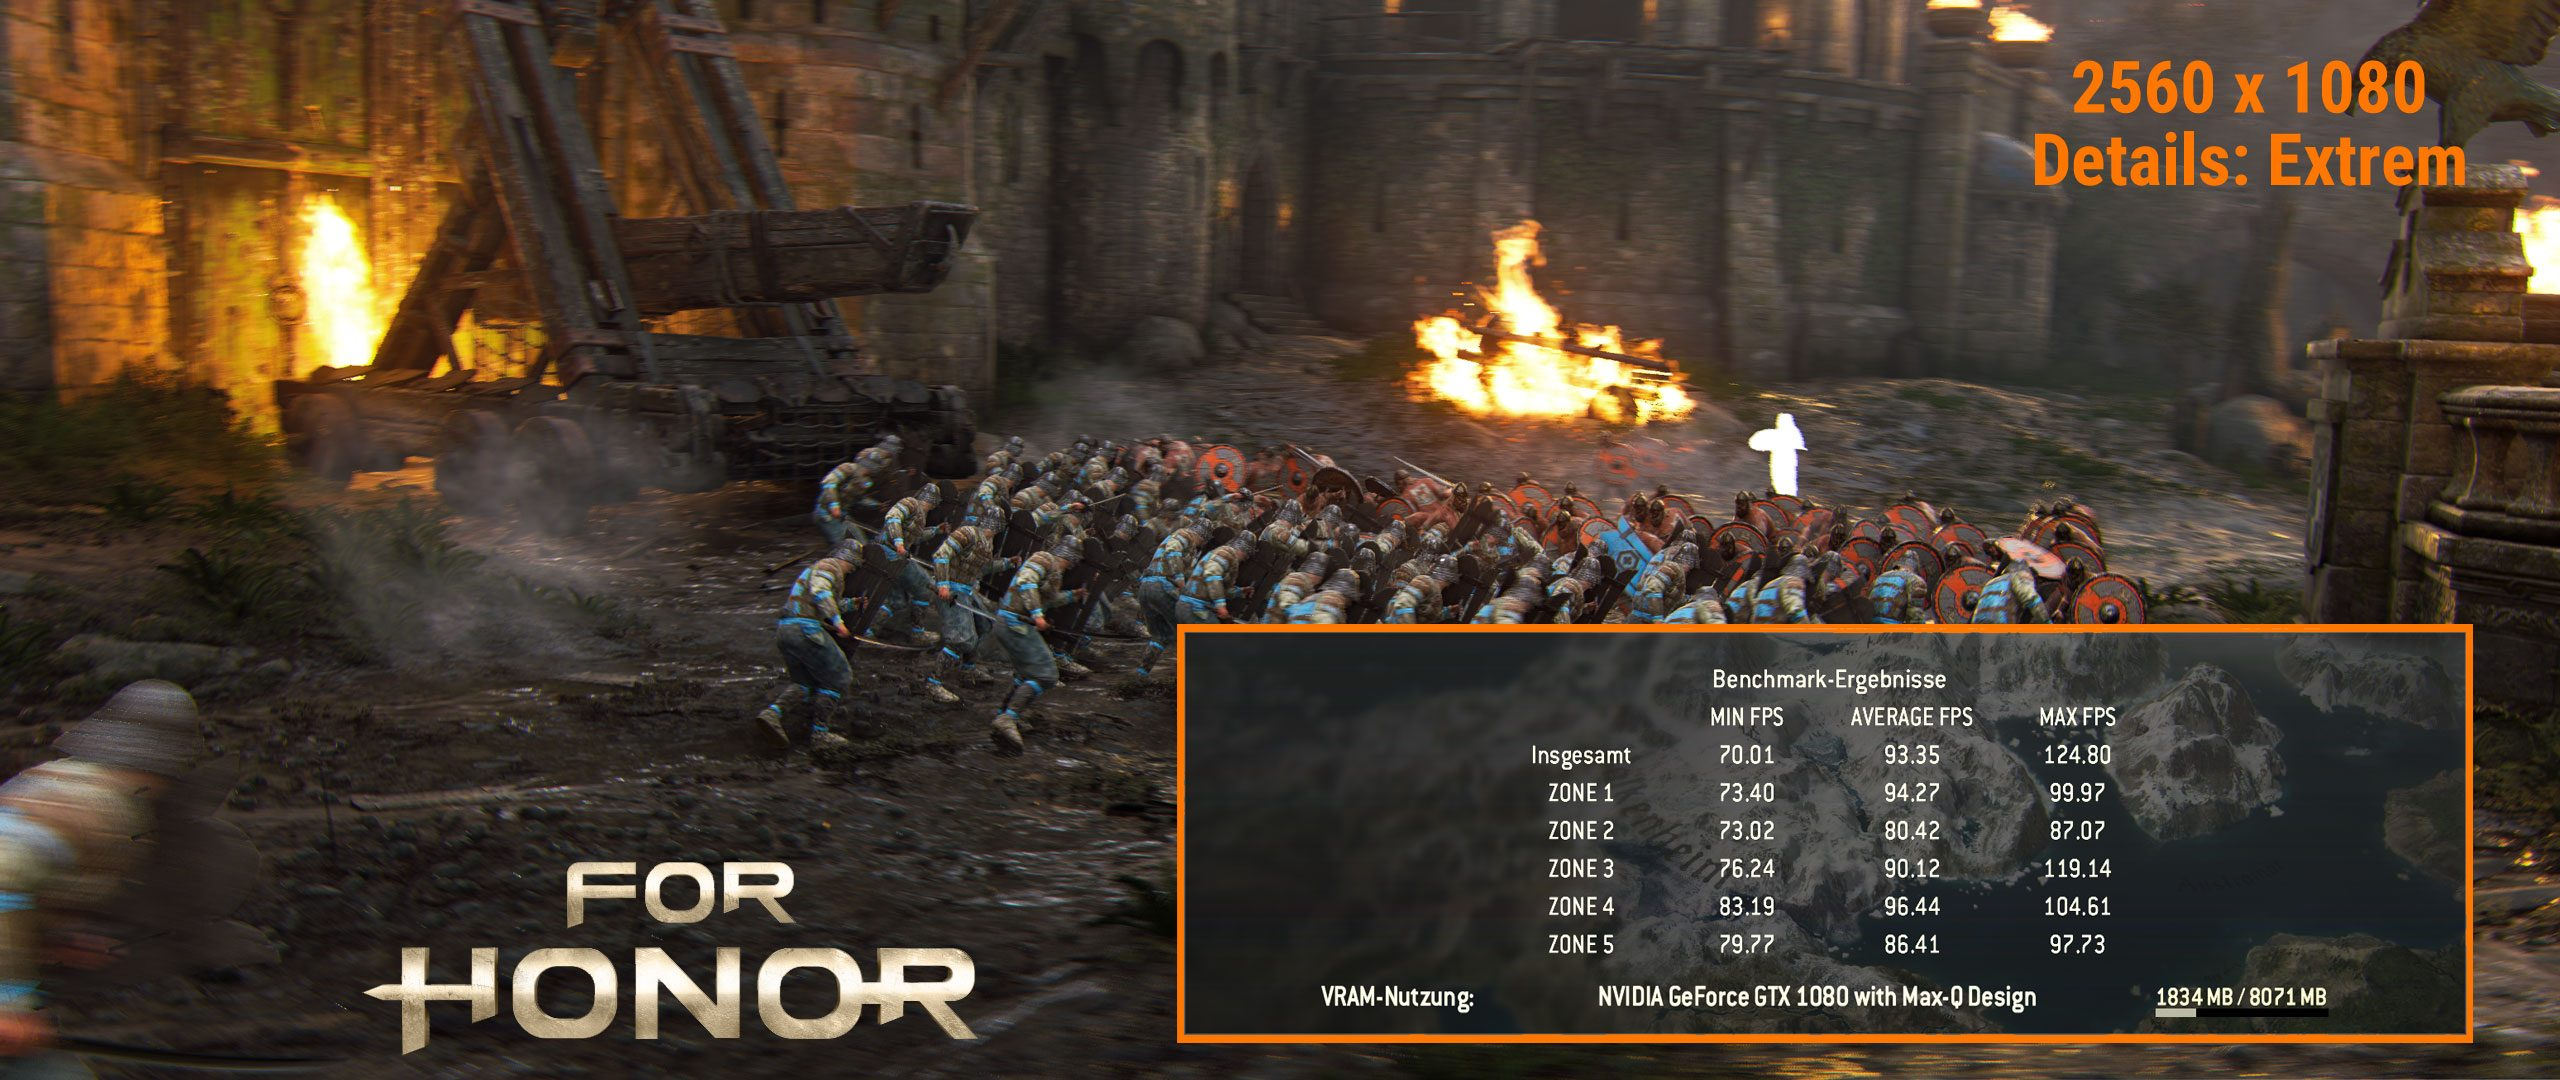 Asus-ROG-Zephyrus-GX501VI-GZ020T_Games-Monitor-7